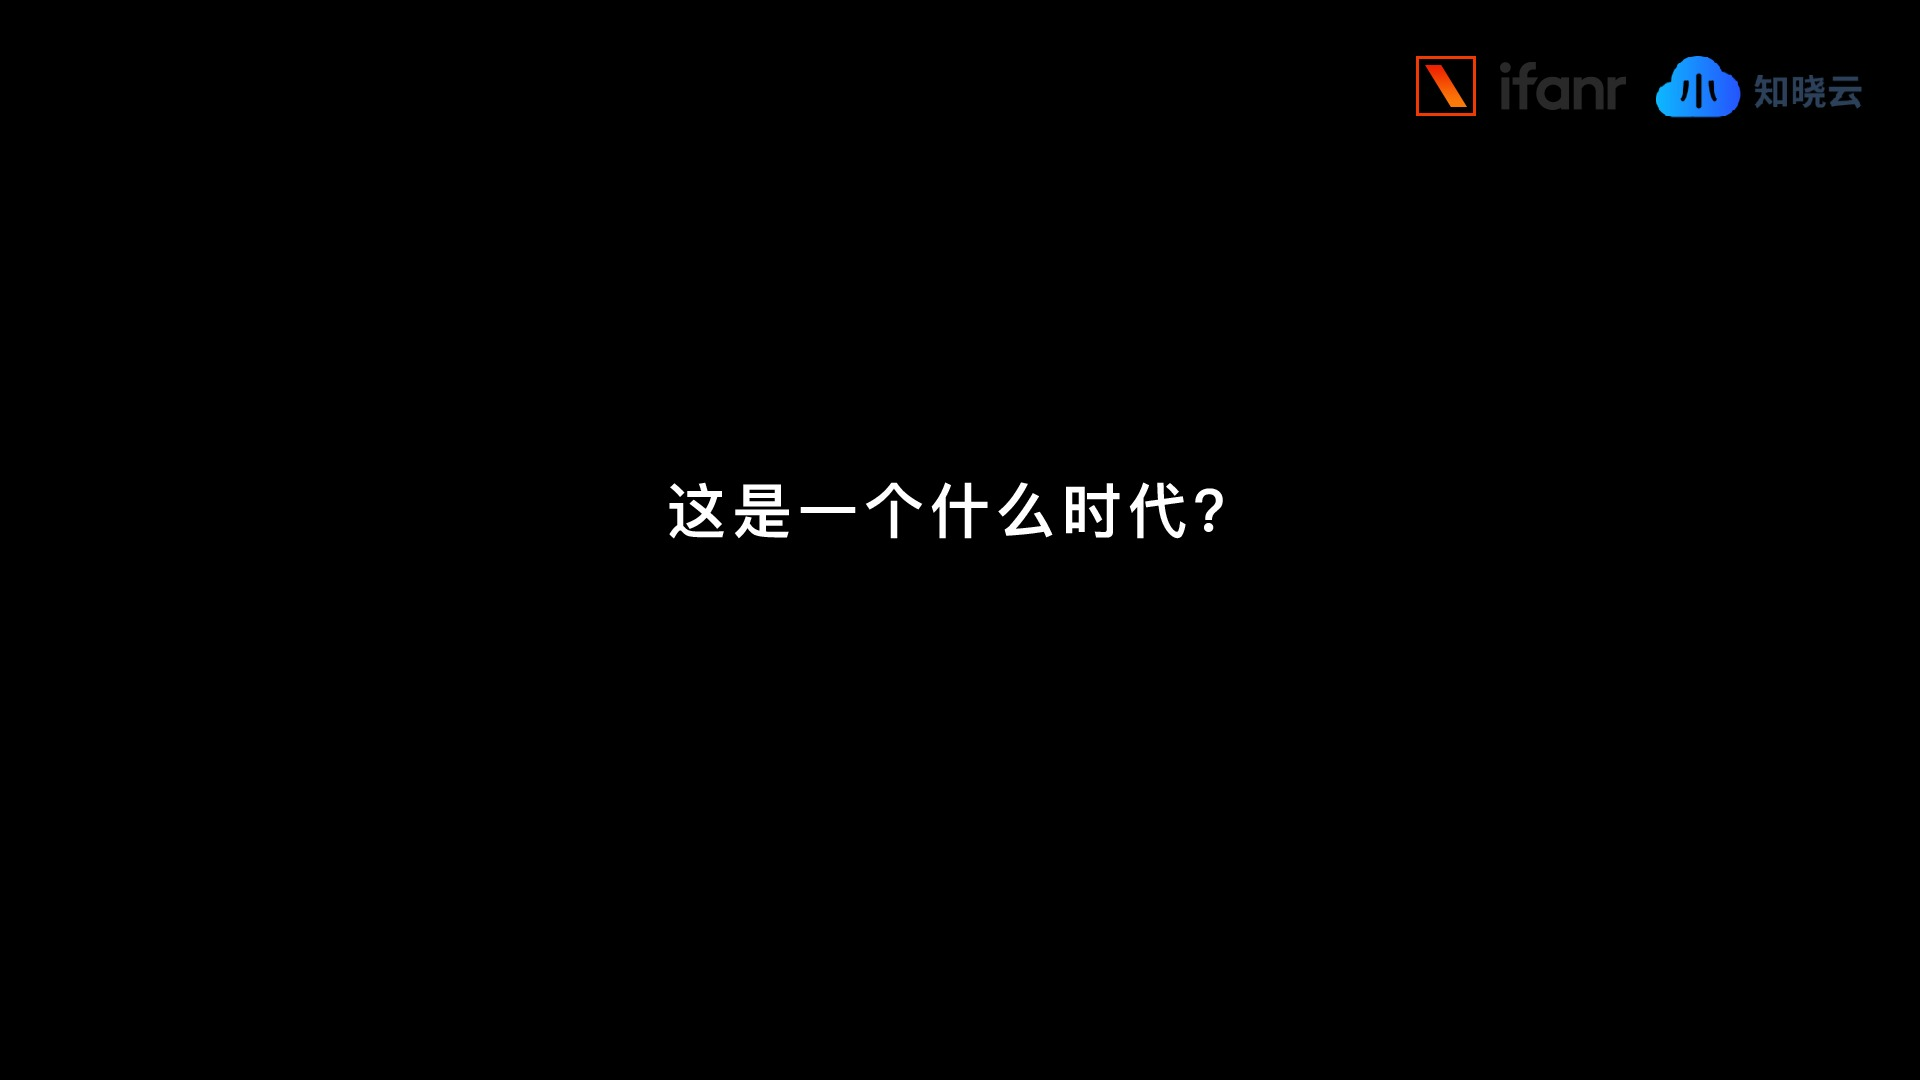 https://opentalk-blog.b0.upaiyun.com/prod/2018-11-26/55bceb55ce285efd2f5d571ec7f0ee3b